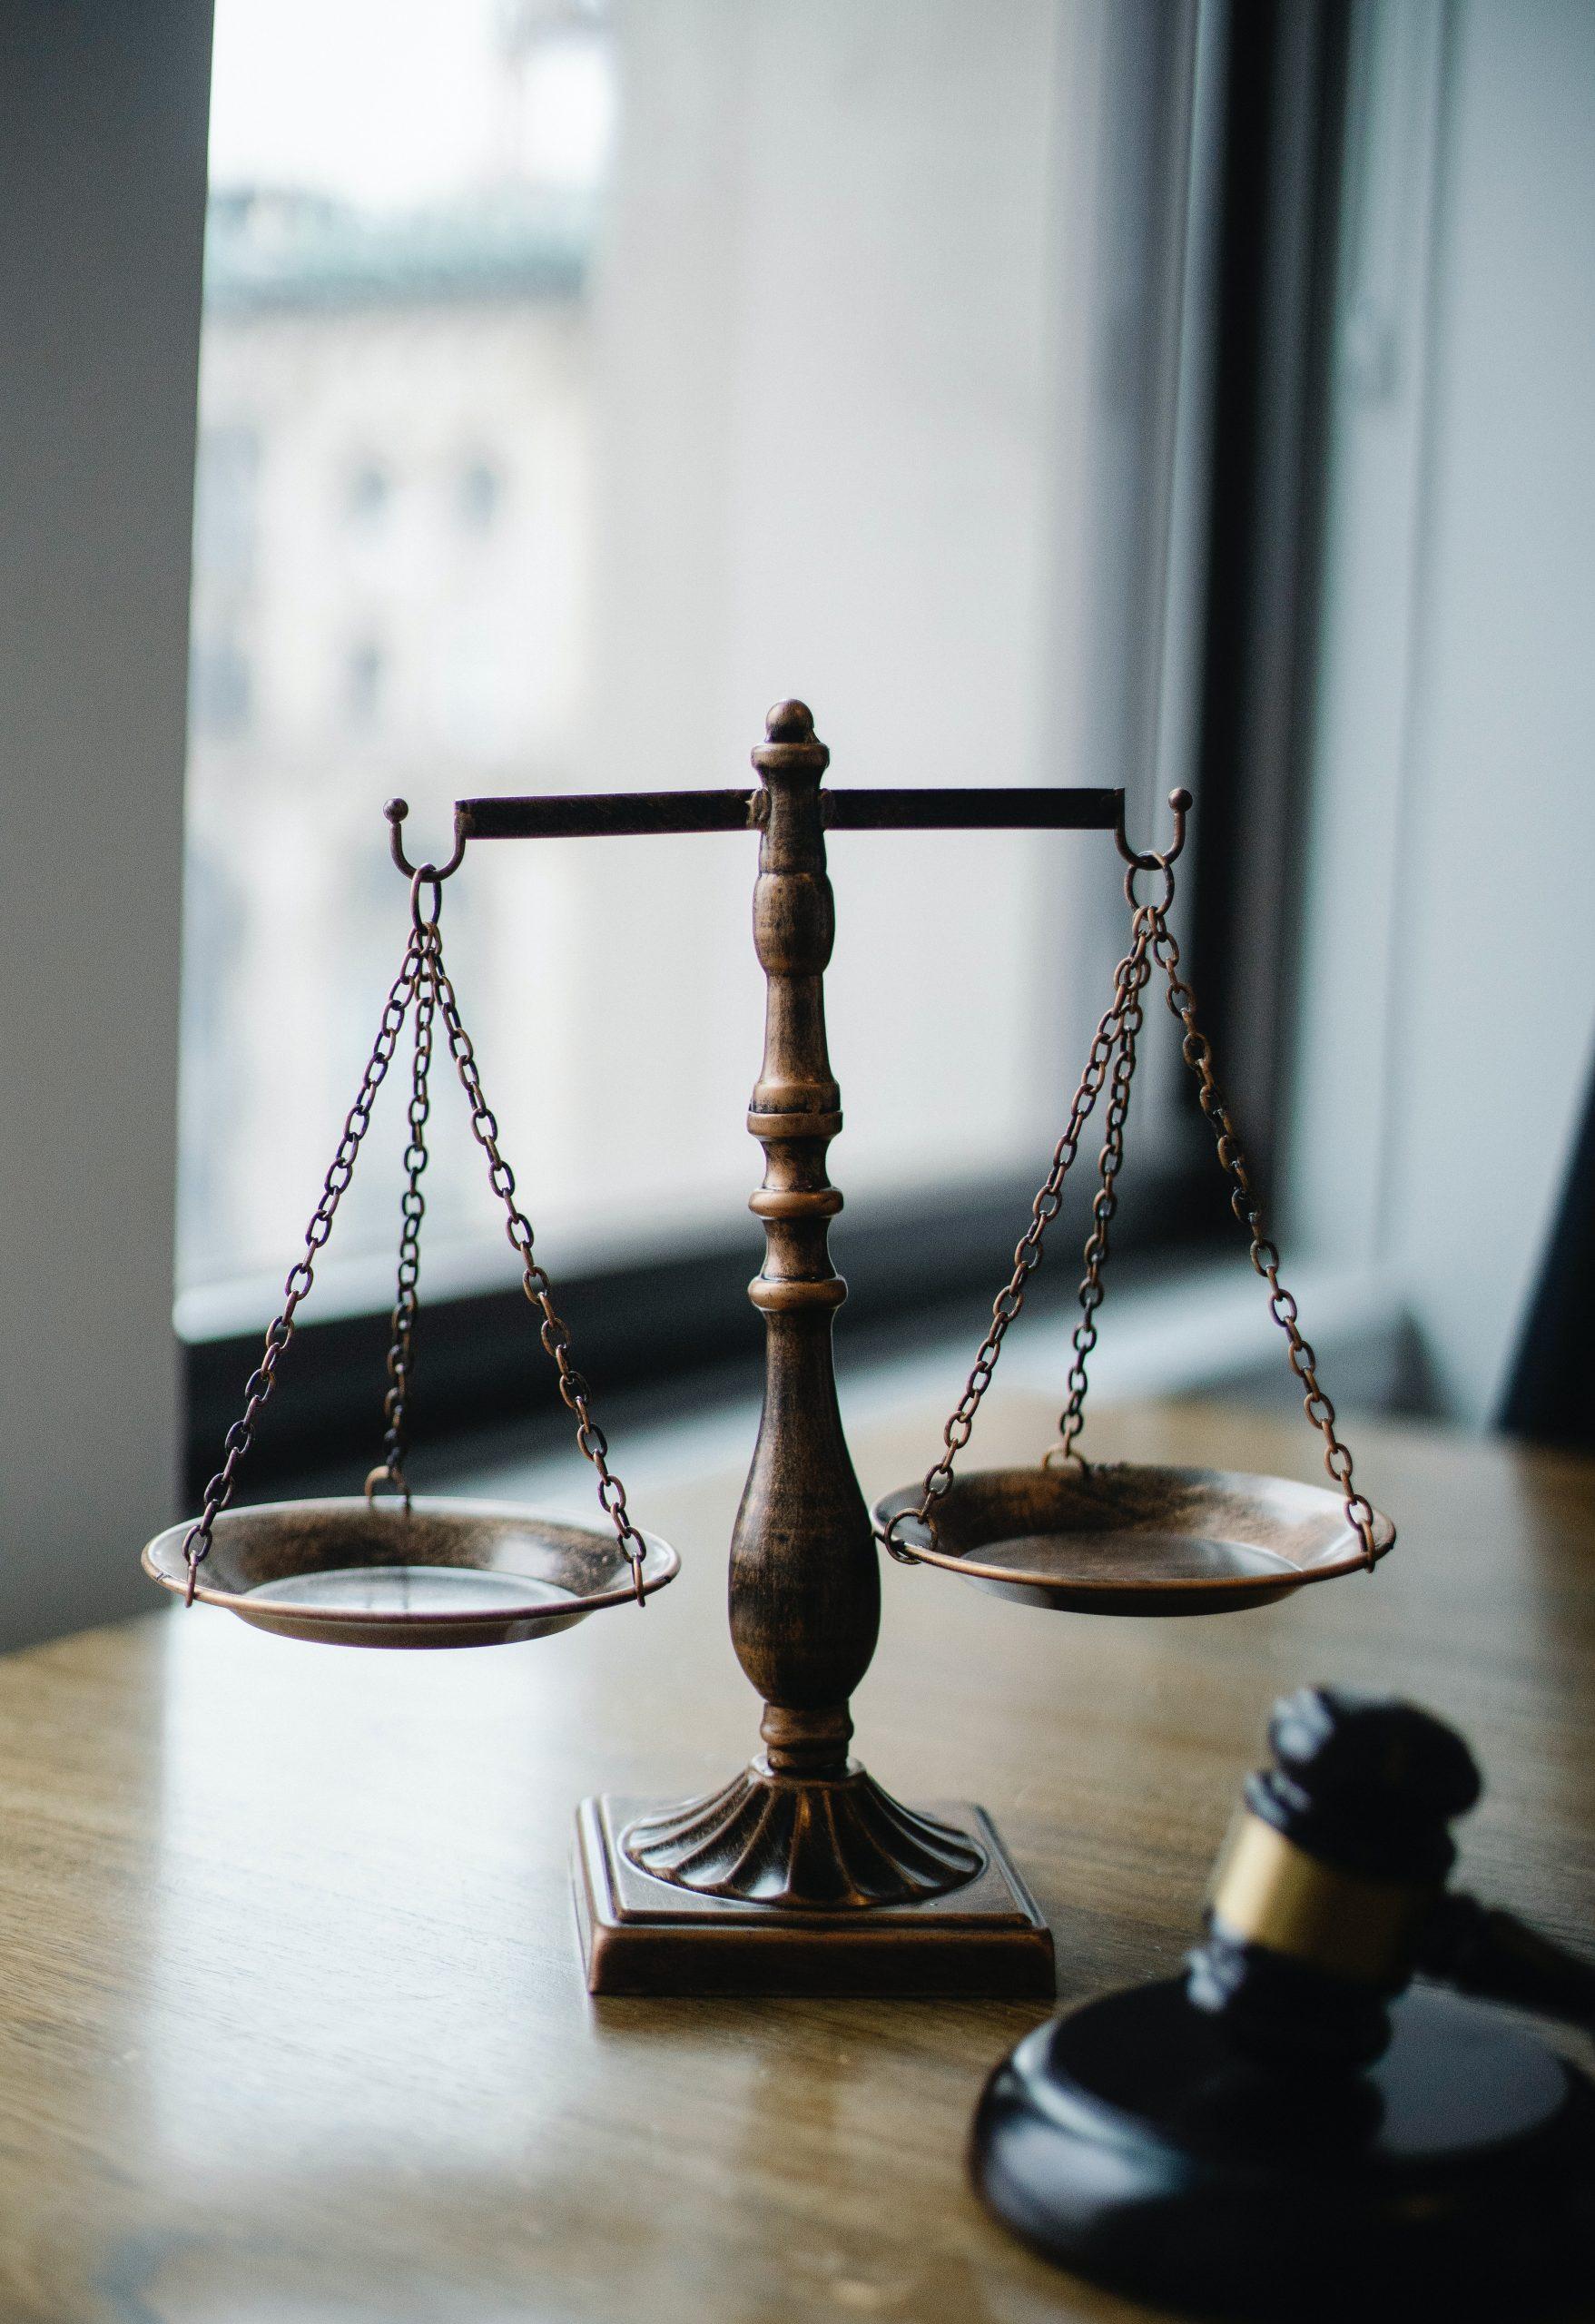 tingey injury law firm